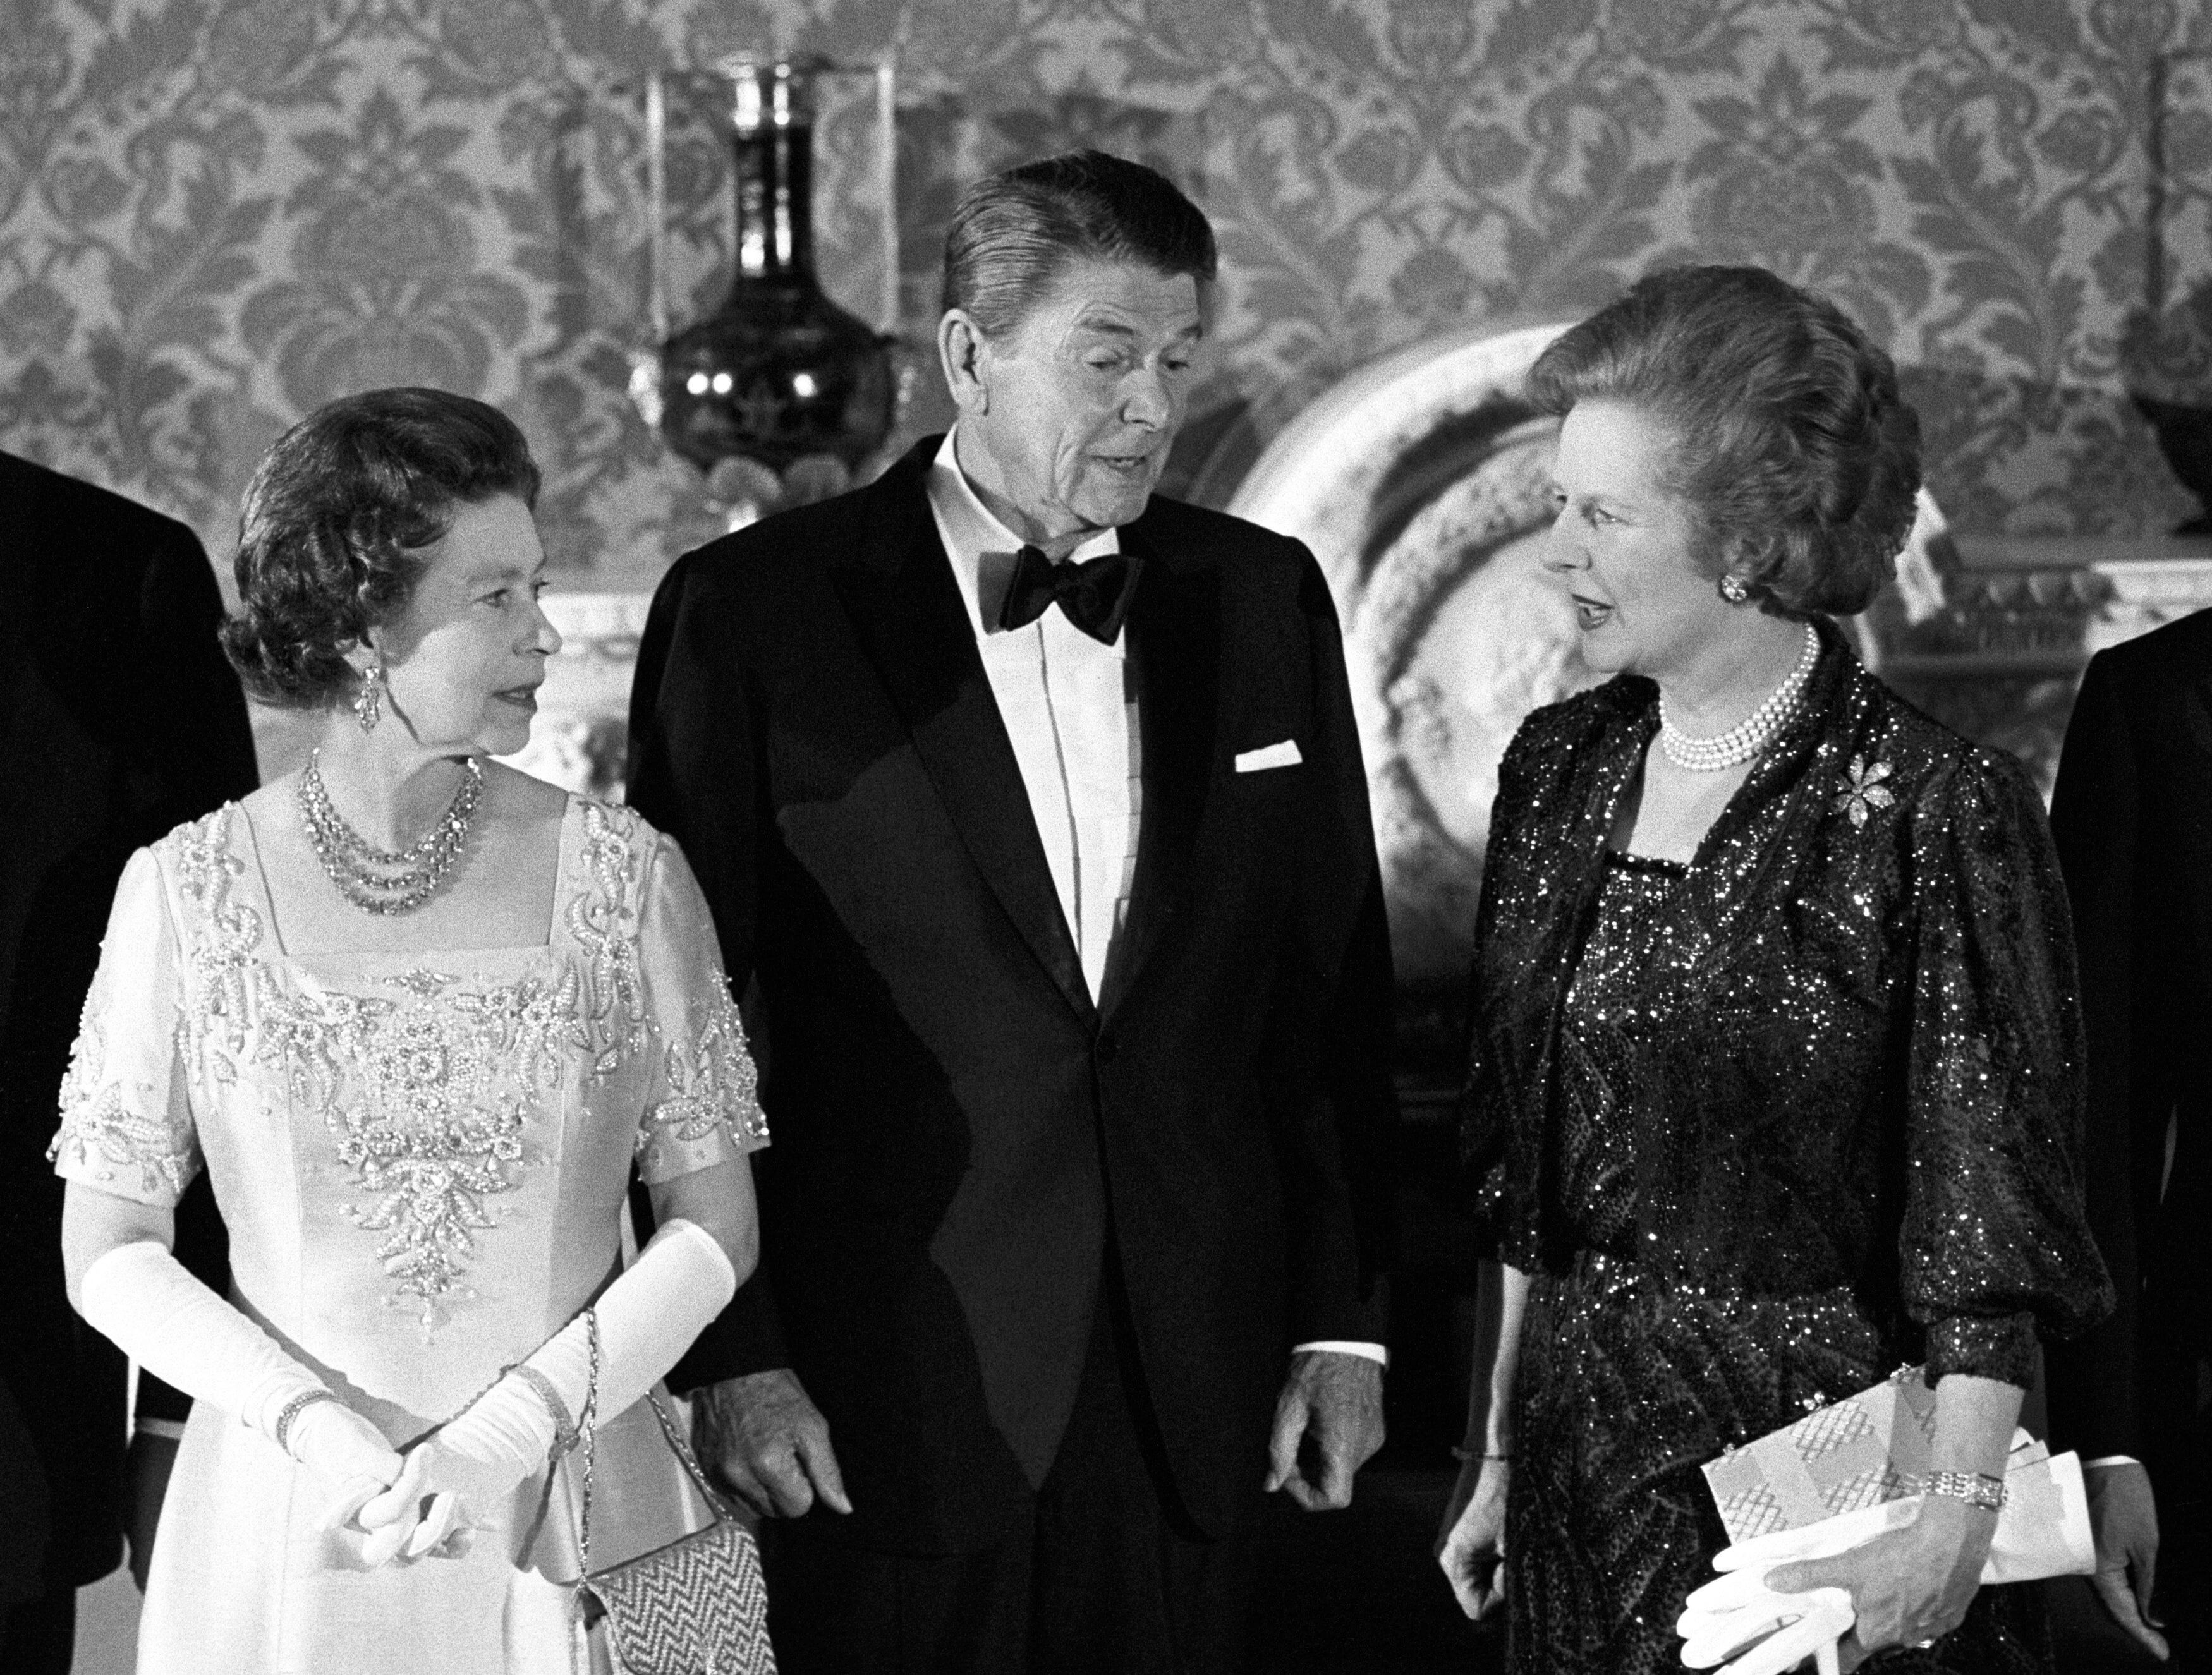 Margaret Thatcher, Queen Elizabeth II., Ronald Reagan, Buckingham Palace, Royals, Premierministerin